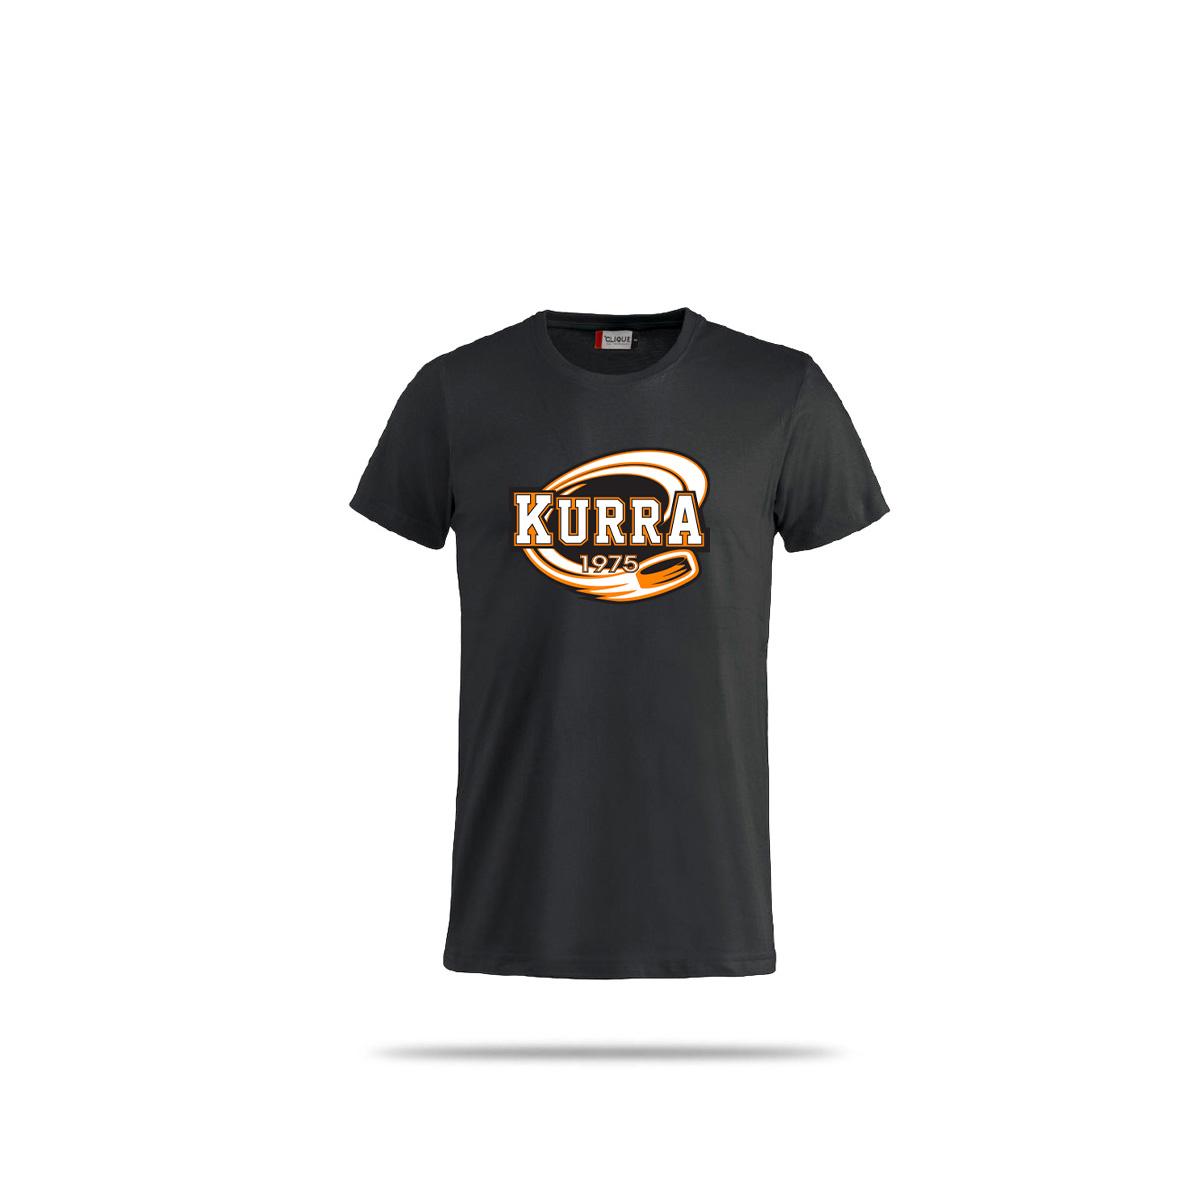 Kurra-Original-3025-musta